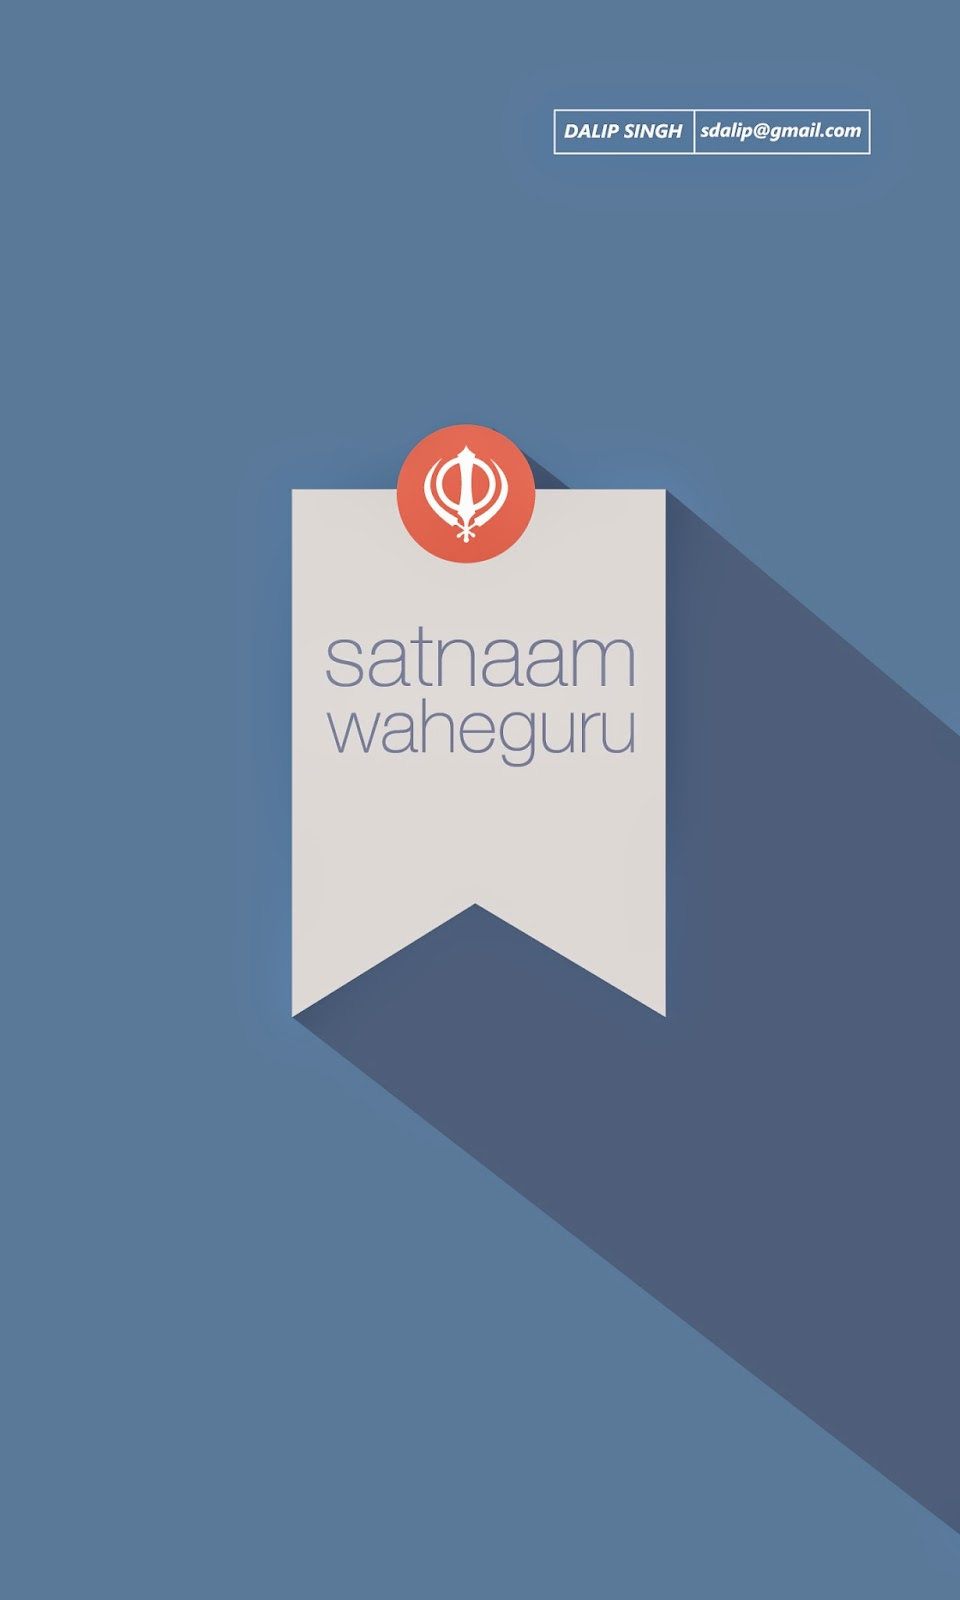 Waheguru Wallpapers For Mobile | www.imgkid.com - The ...